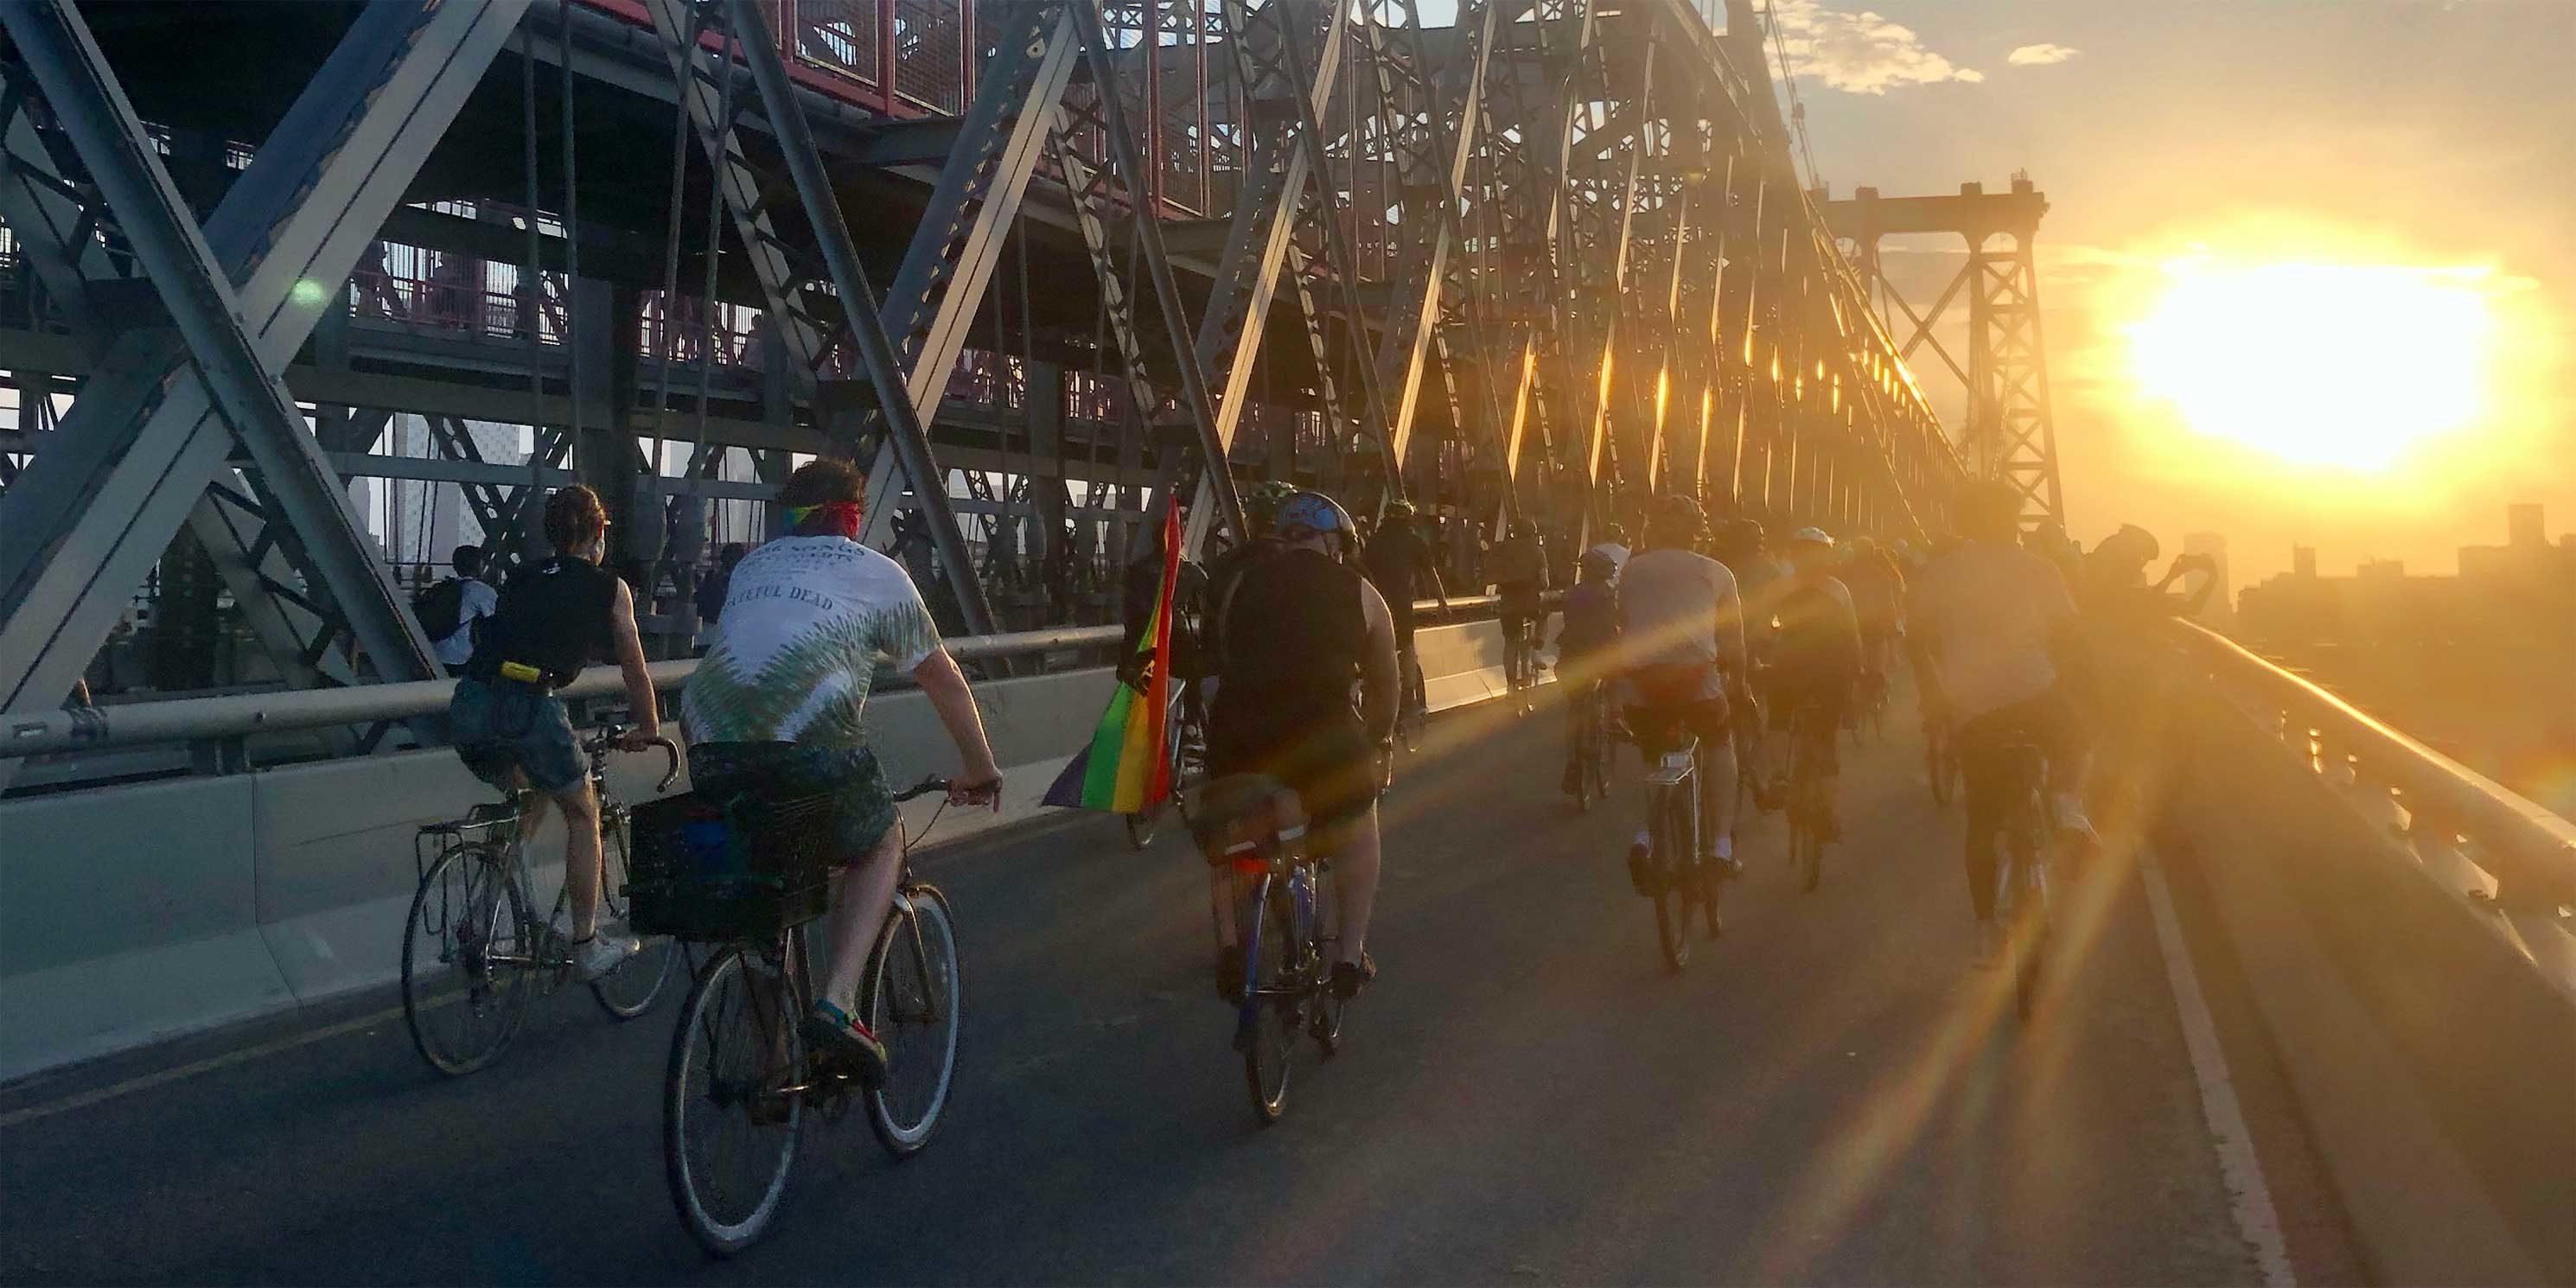 bicyclists ride across bridge in New York City